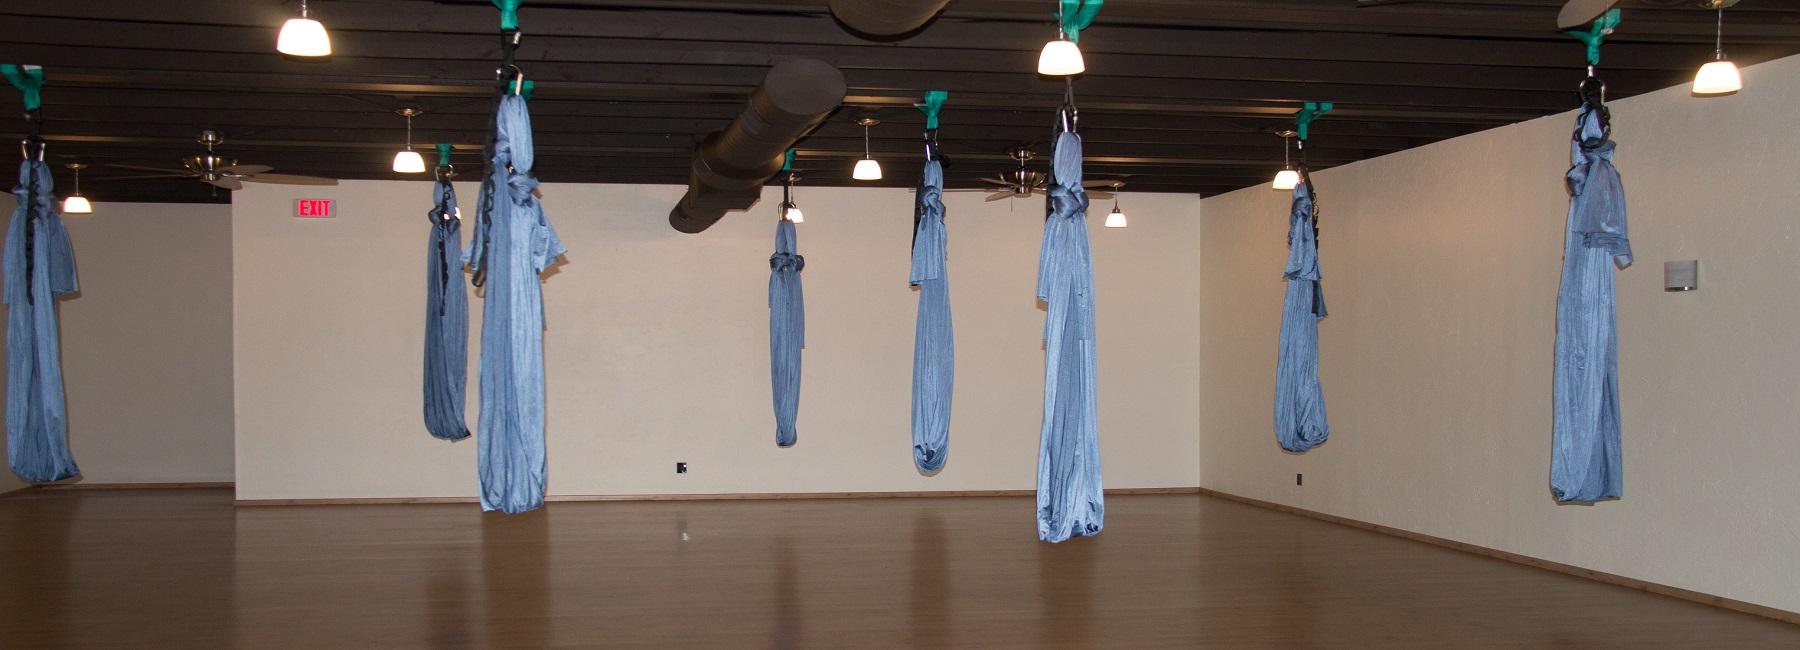 hammocks-banner